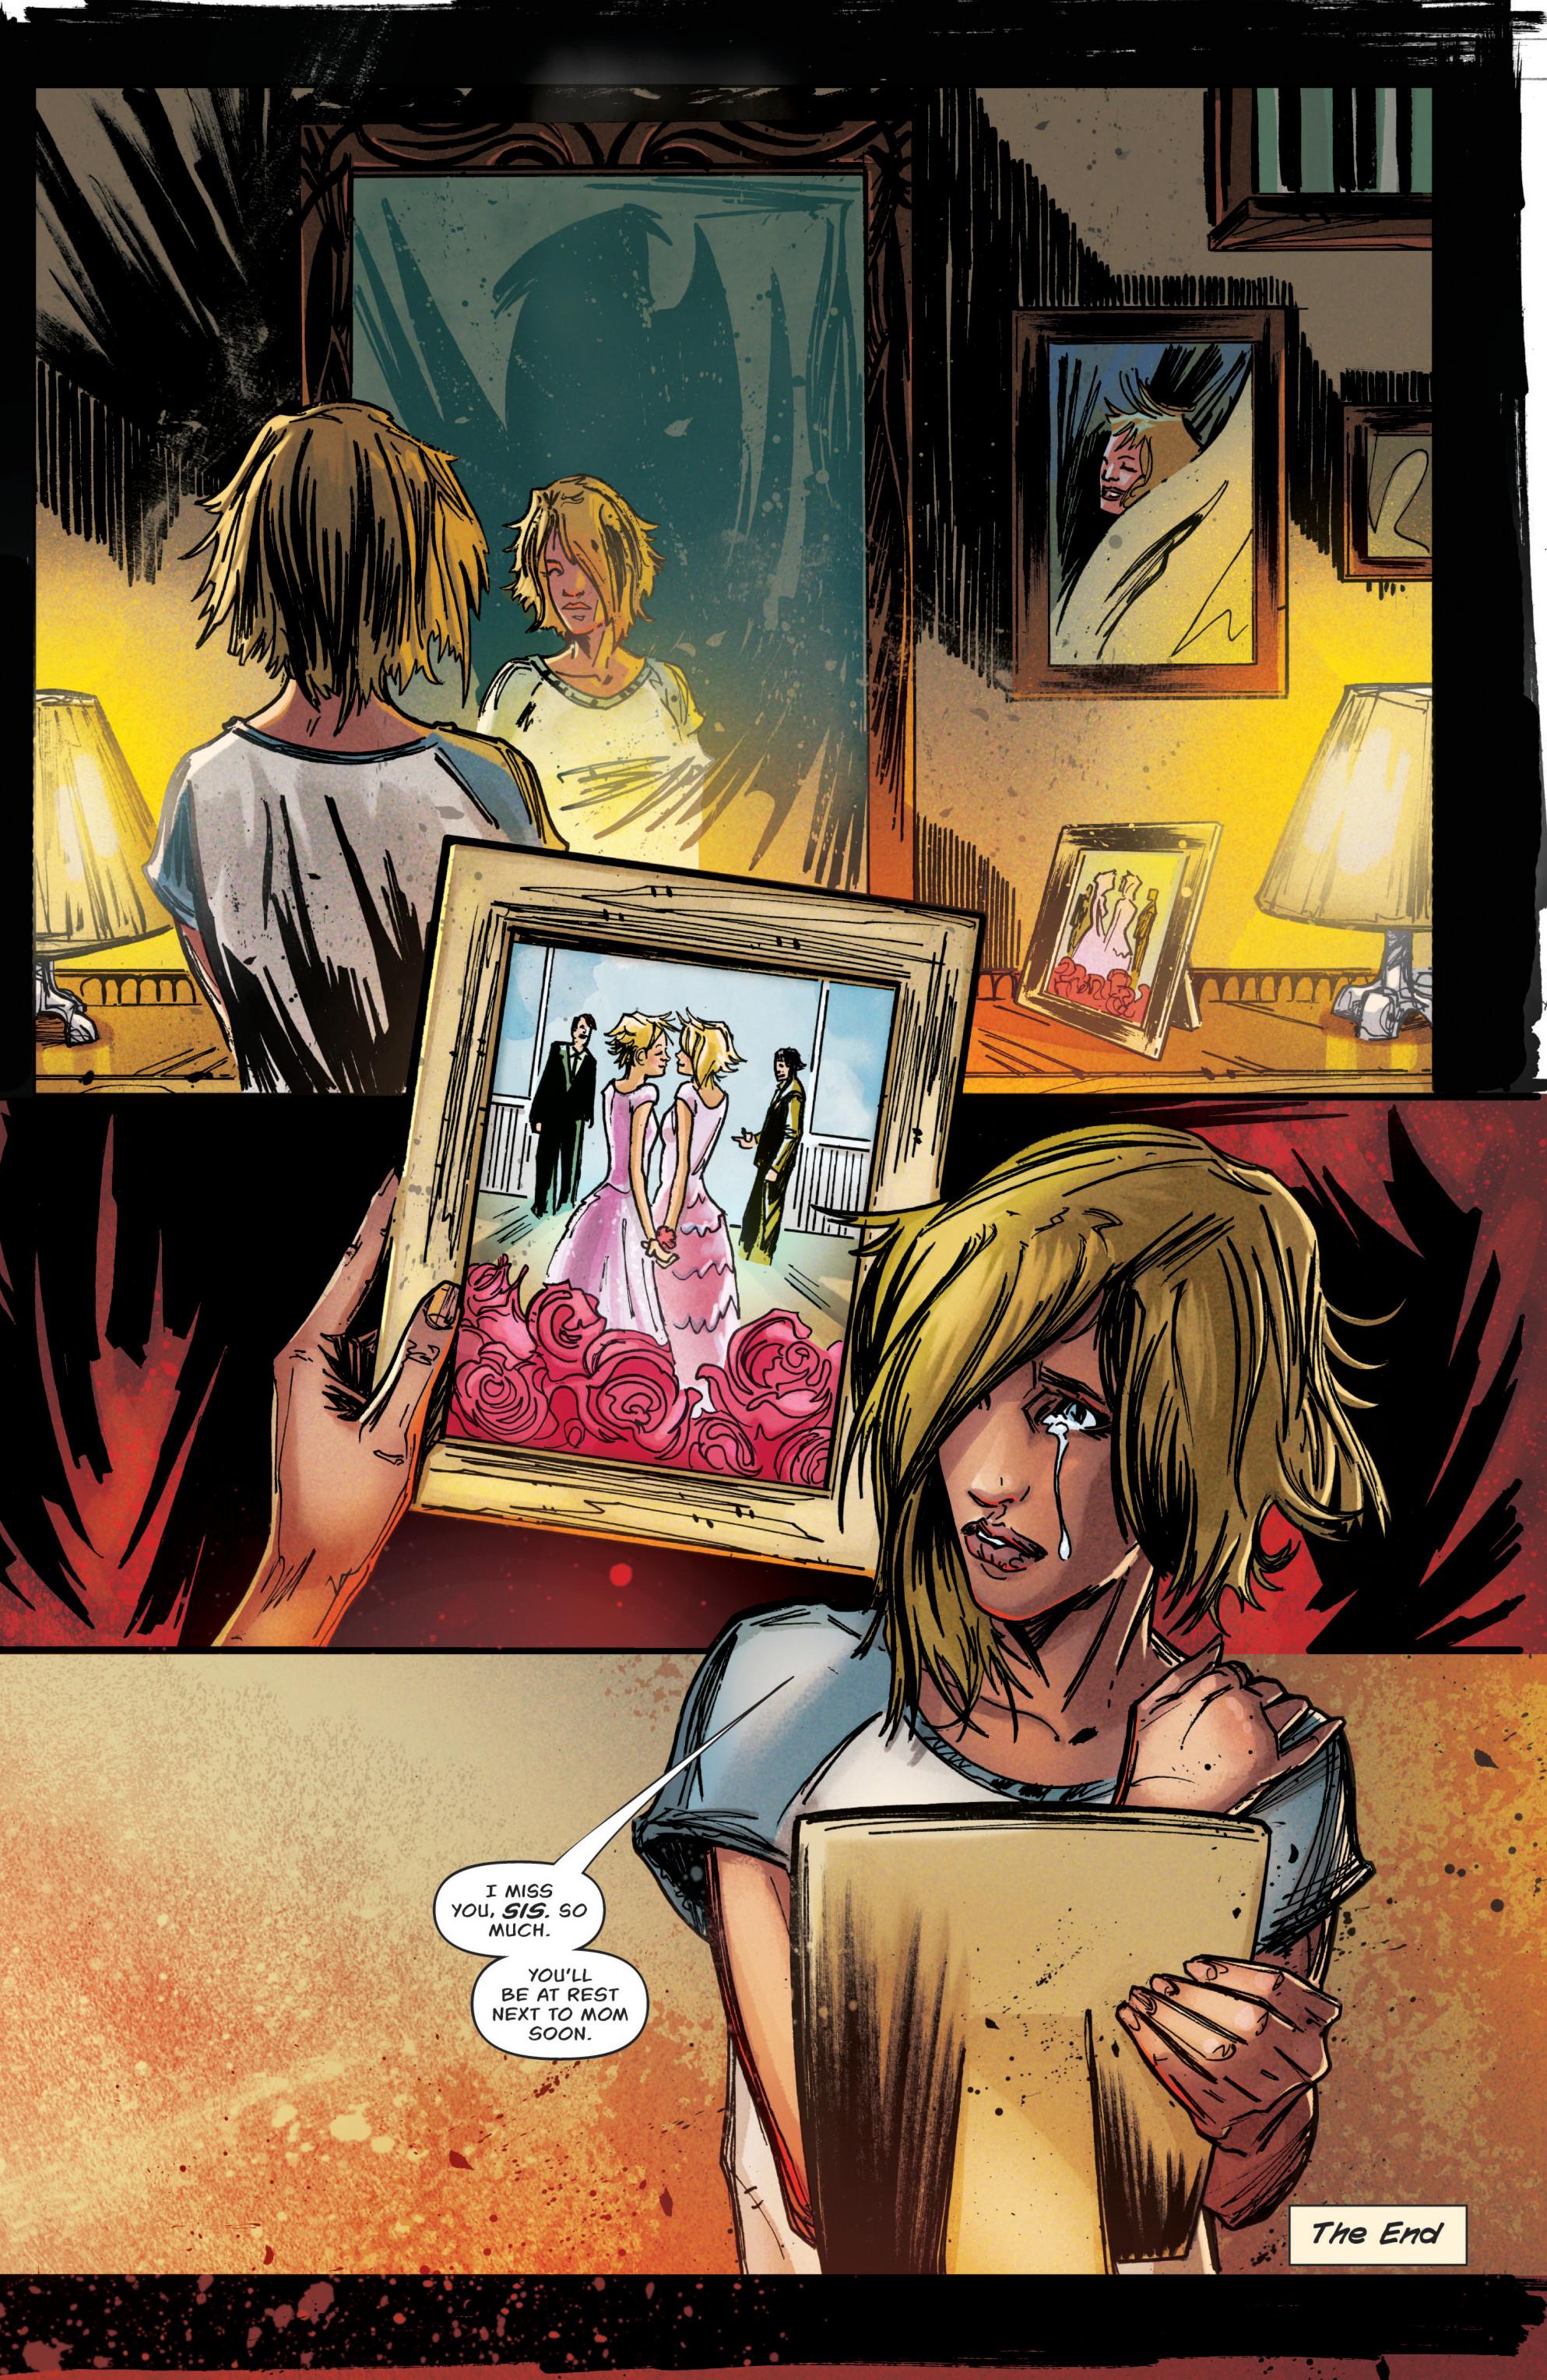 Read online Grimm Tales of Terror: Vol. 3 comic -  Issue #5 - 24